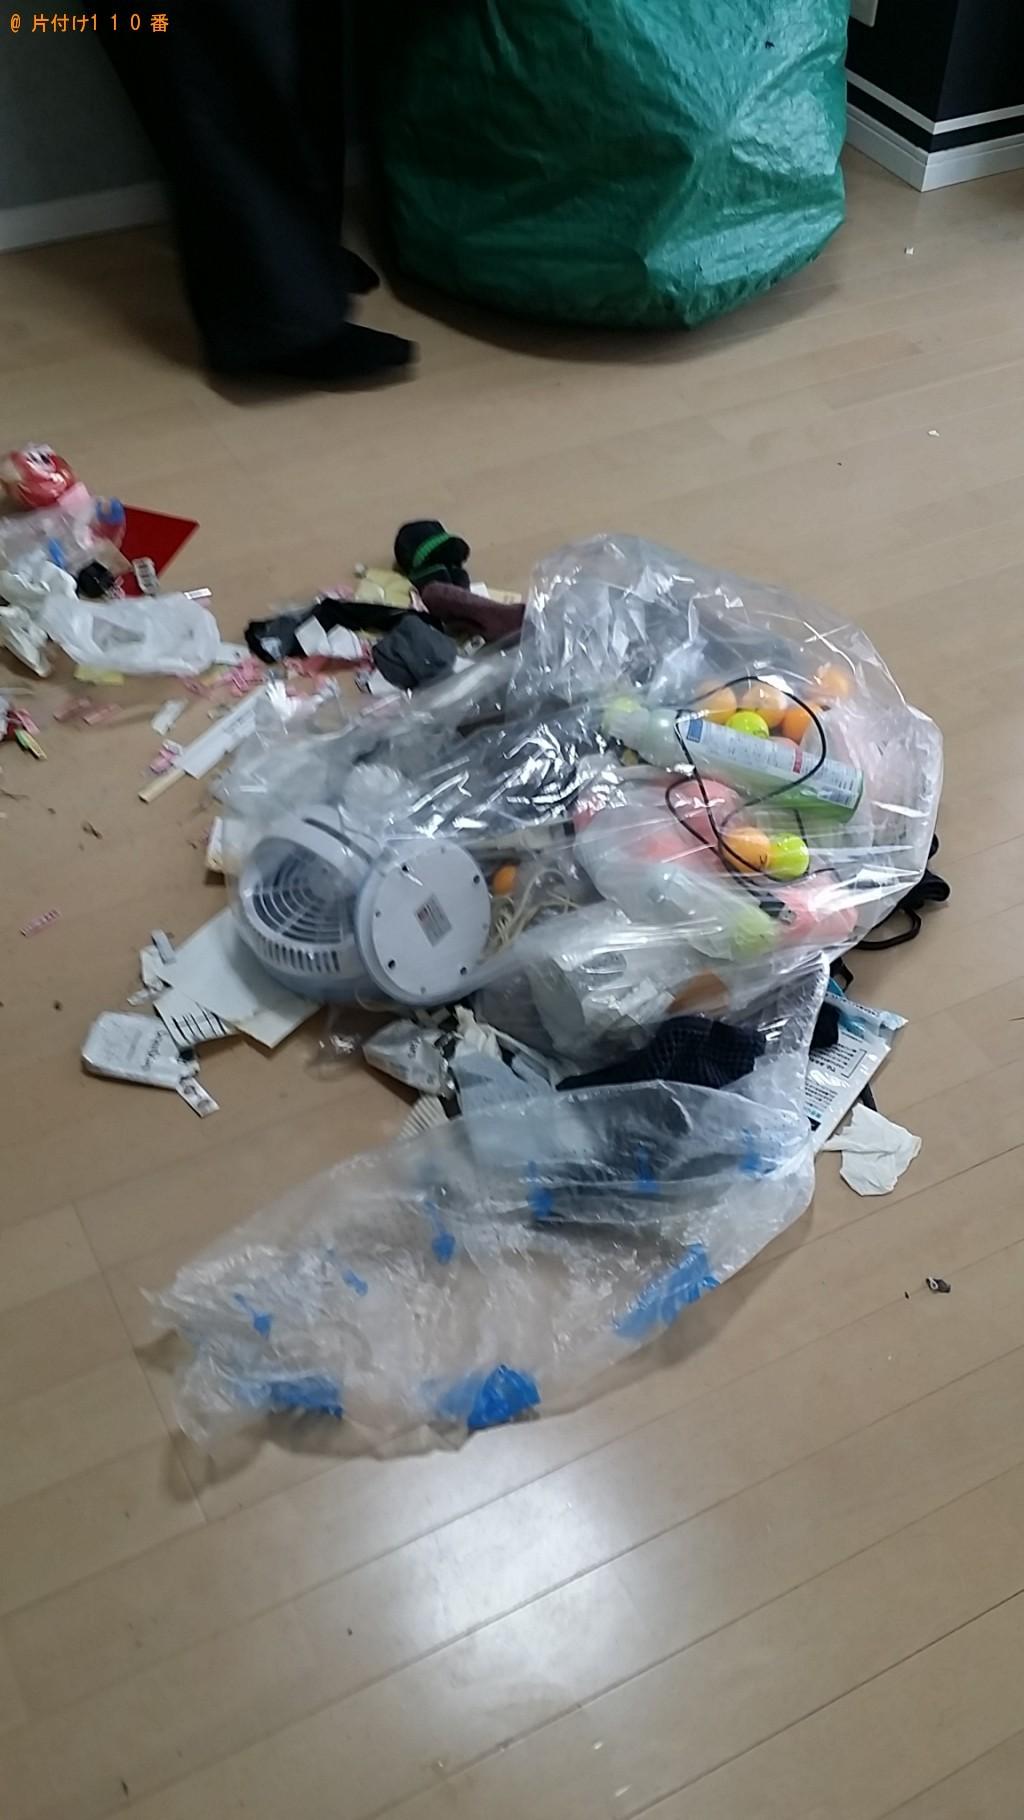 【鹿児島市樋之口町】軽トラック1台程度の出張不用品の回収・処分